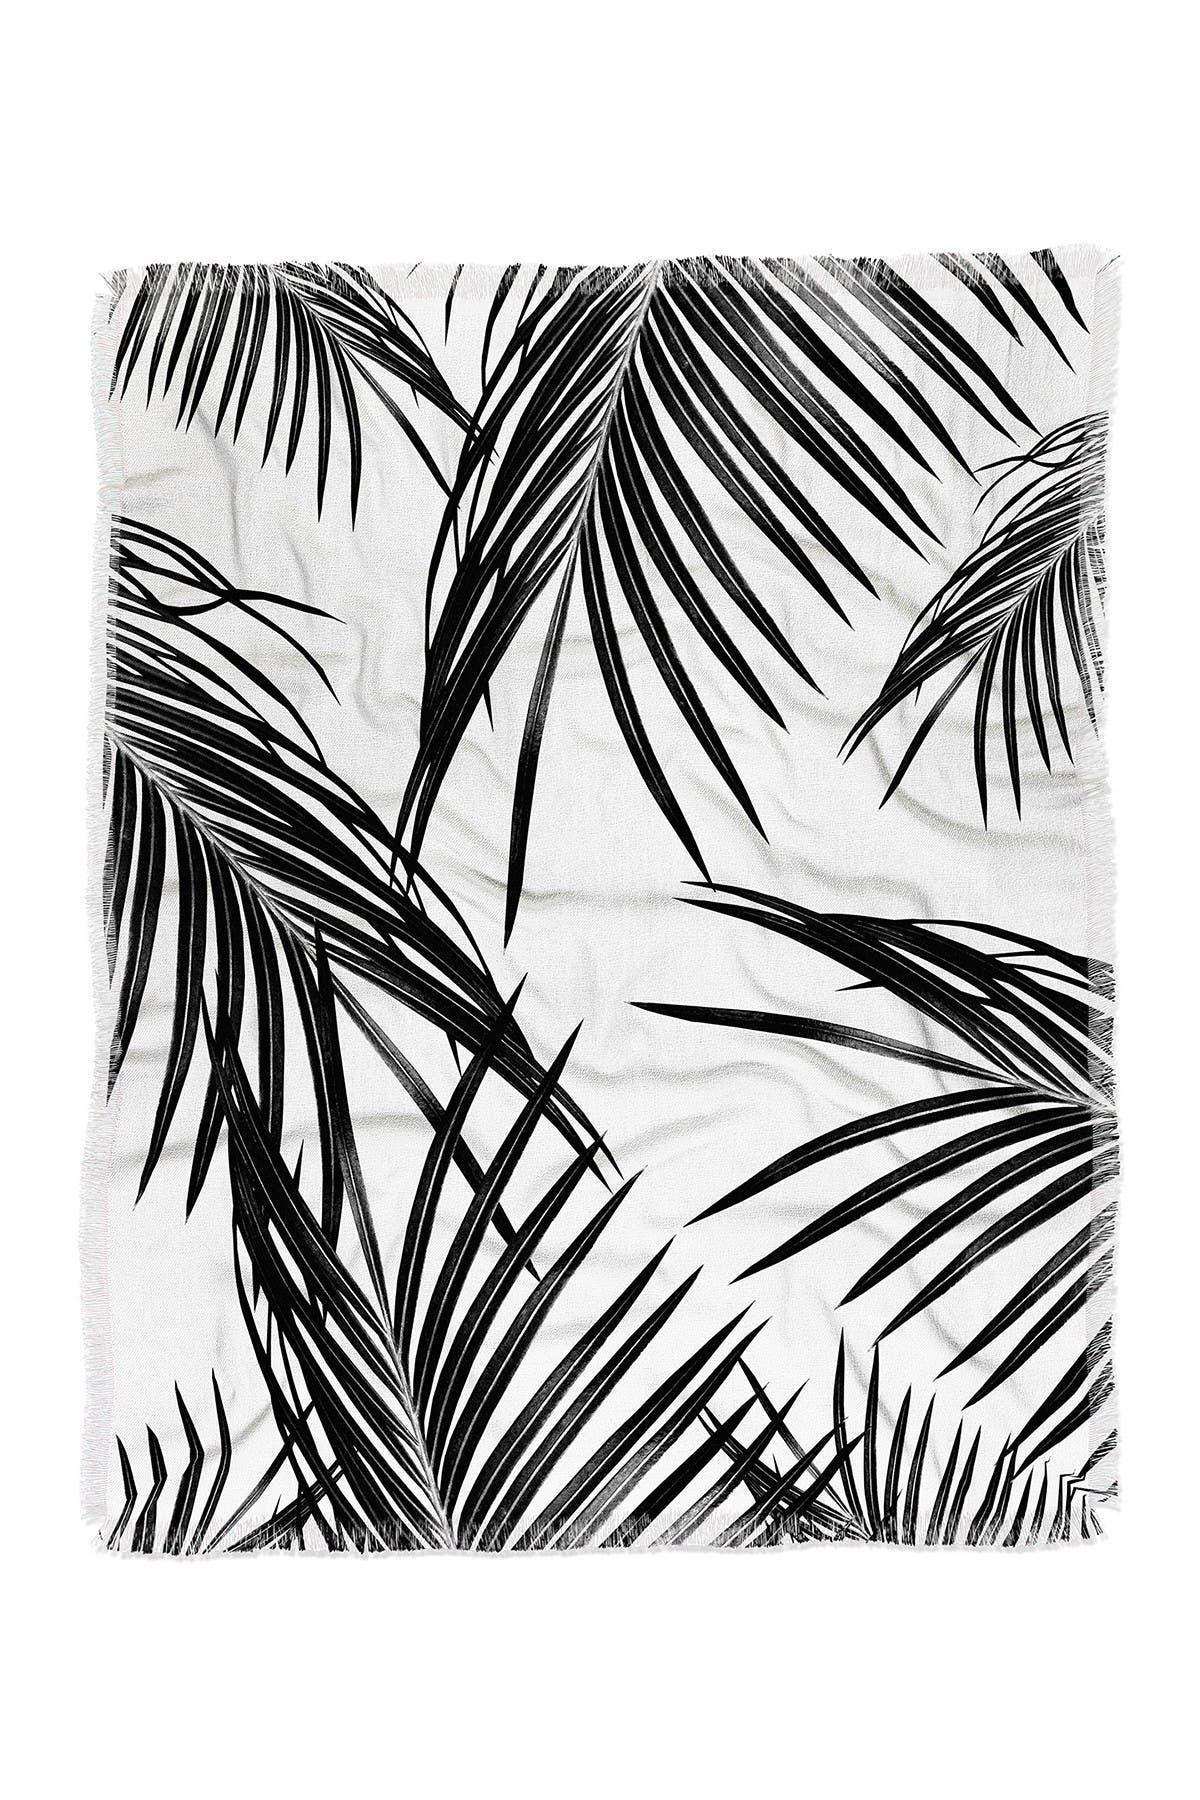 Image of Deny Designs anitabellajantzart Black Palm Leaves Dream 1 Woven Throw Blanket